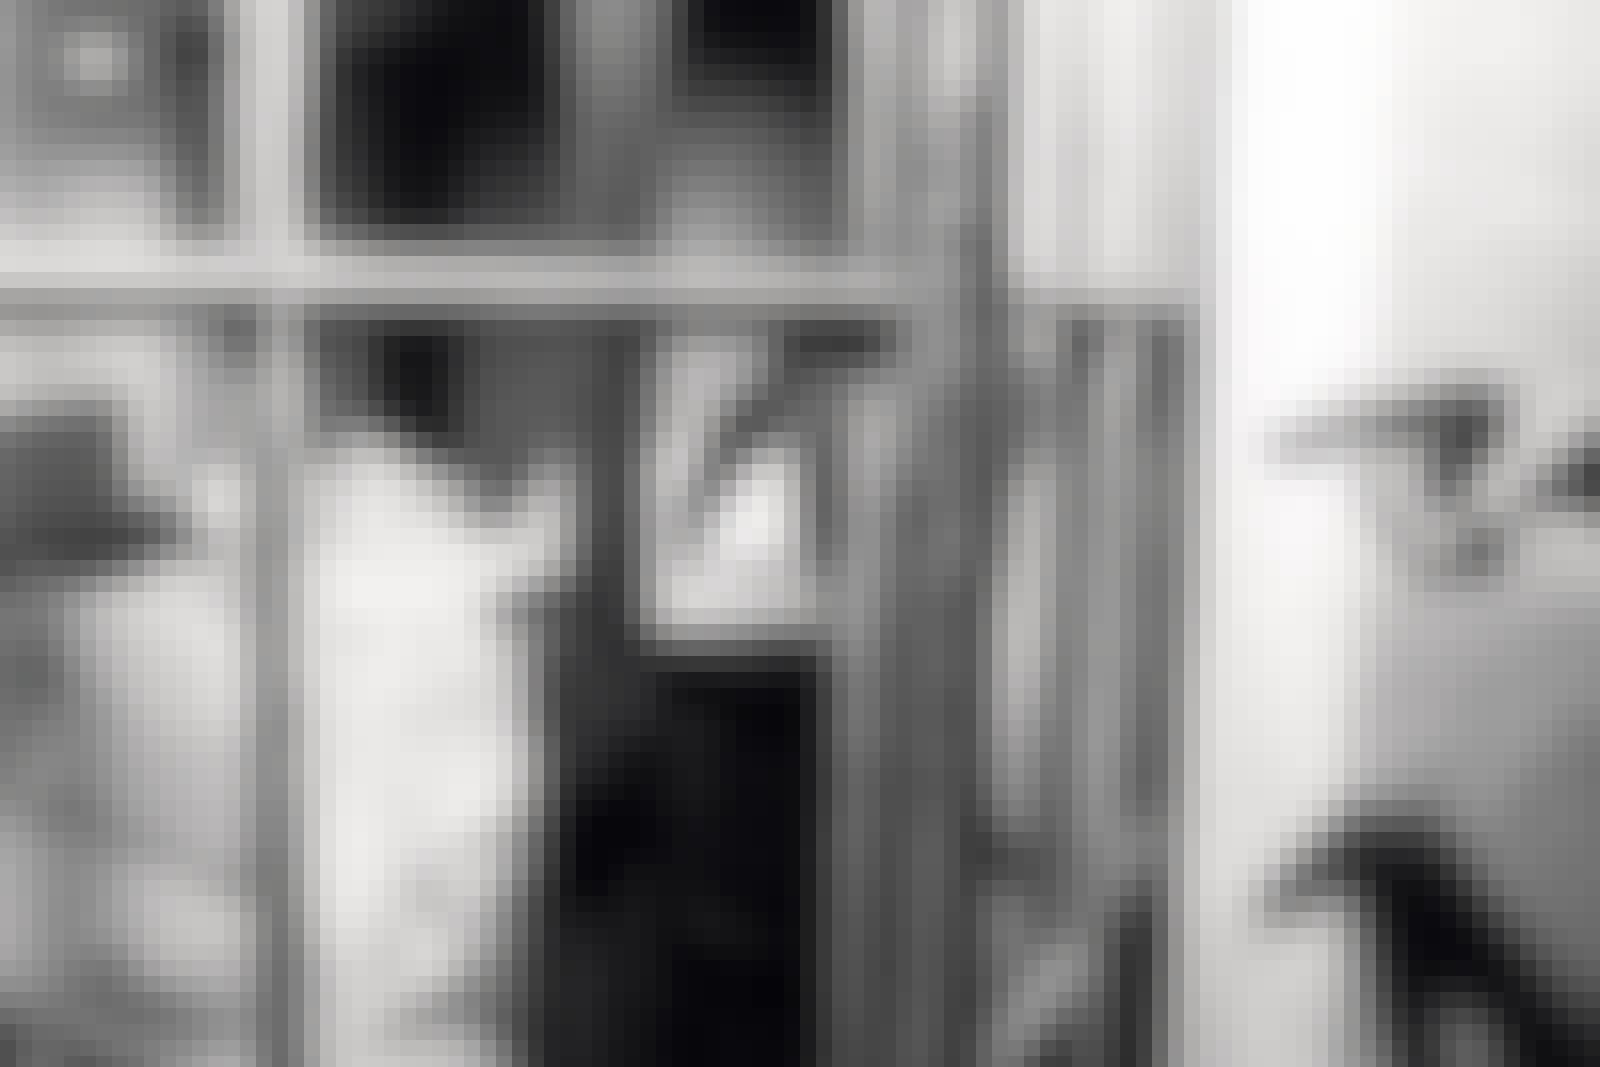 Monroe's window